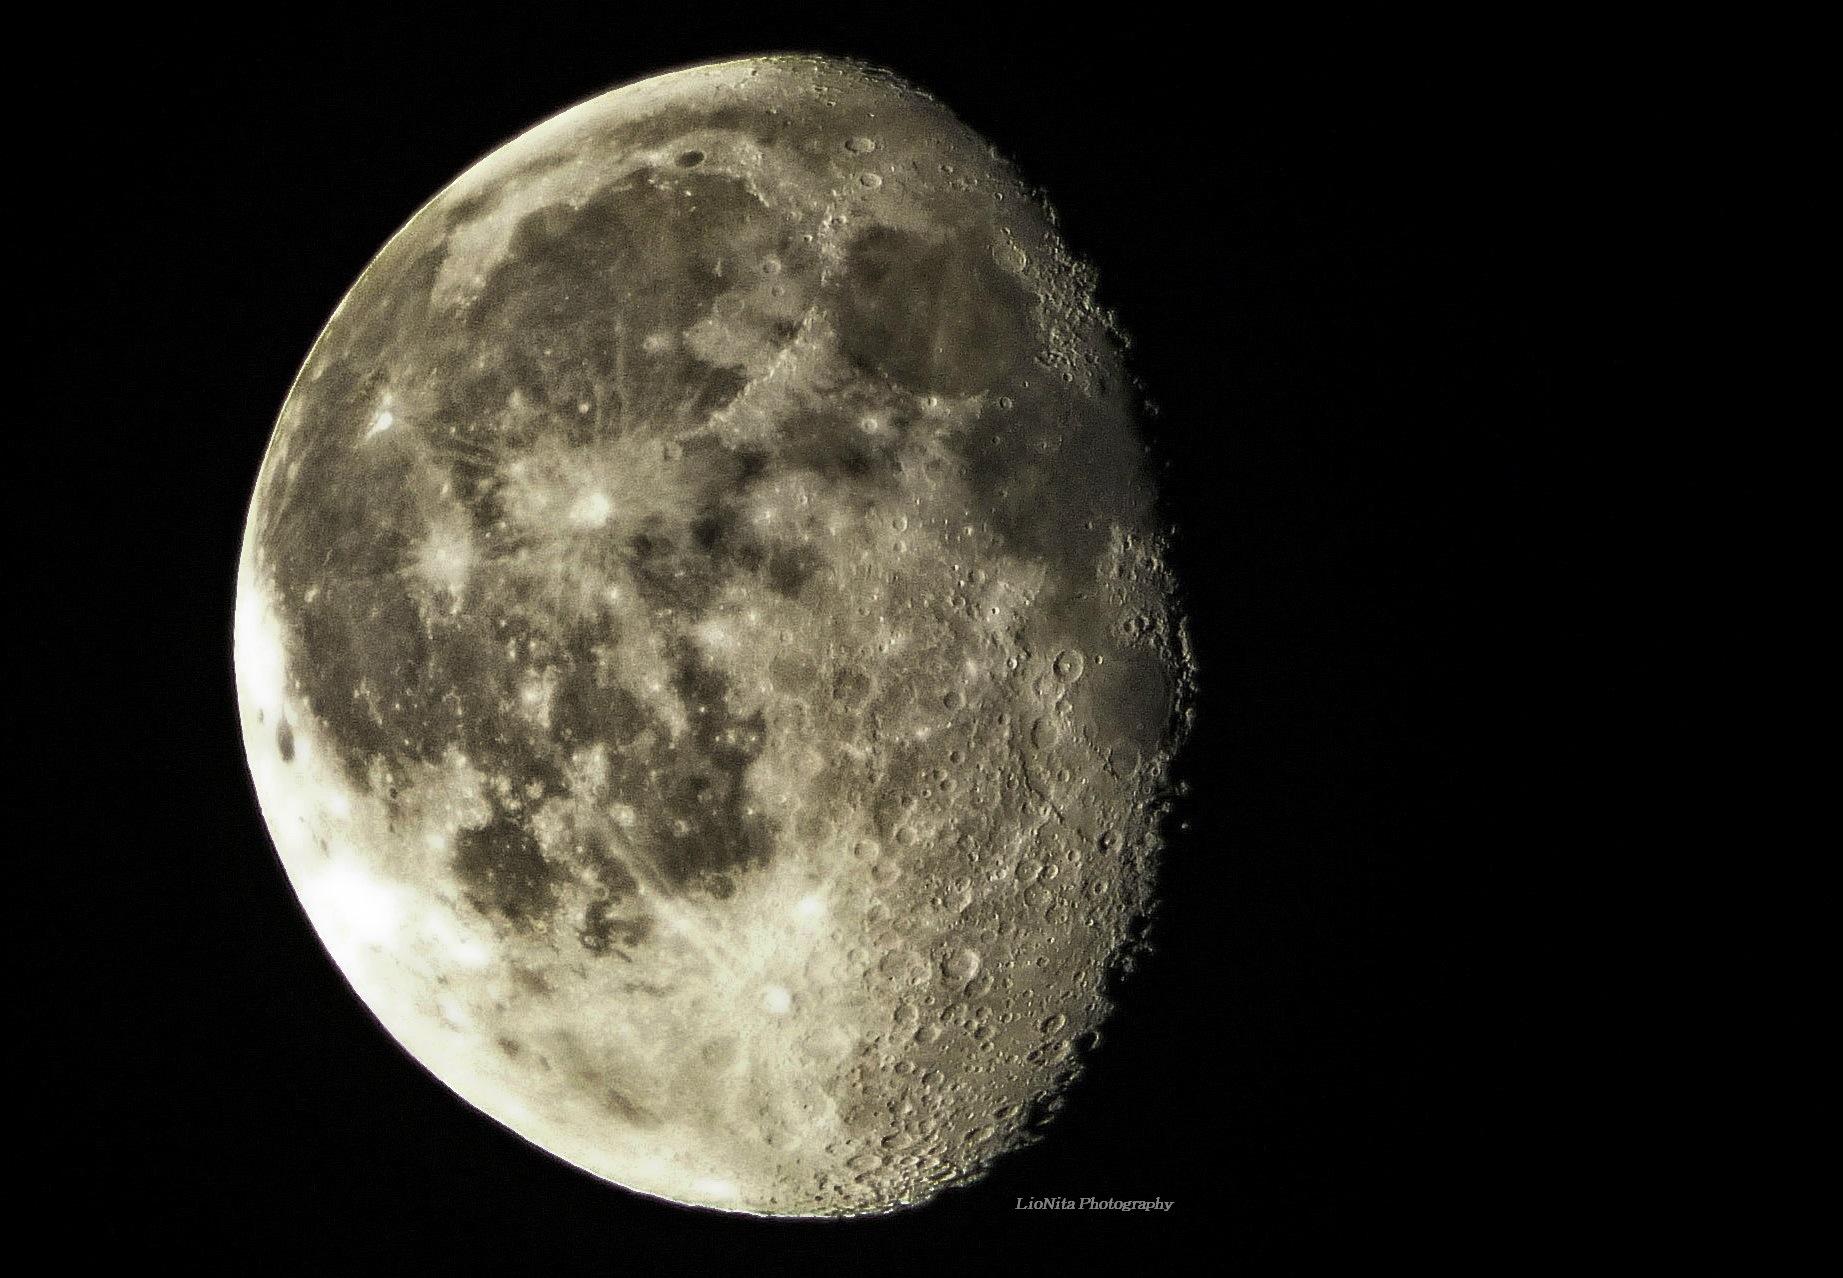 Mystic Moon by LioNita Photography